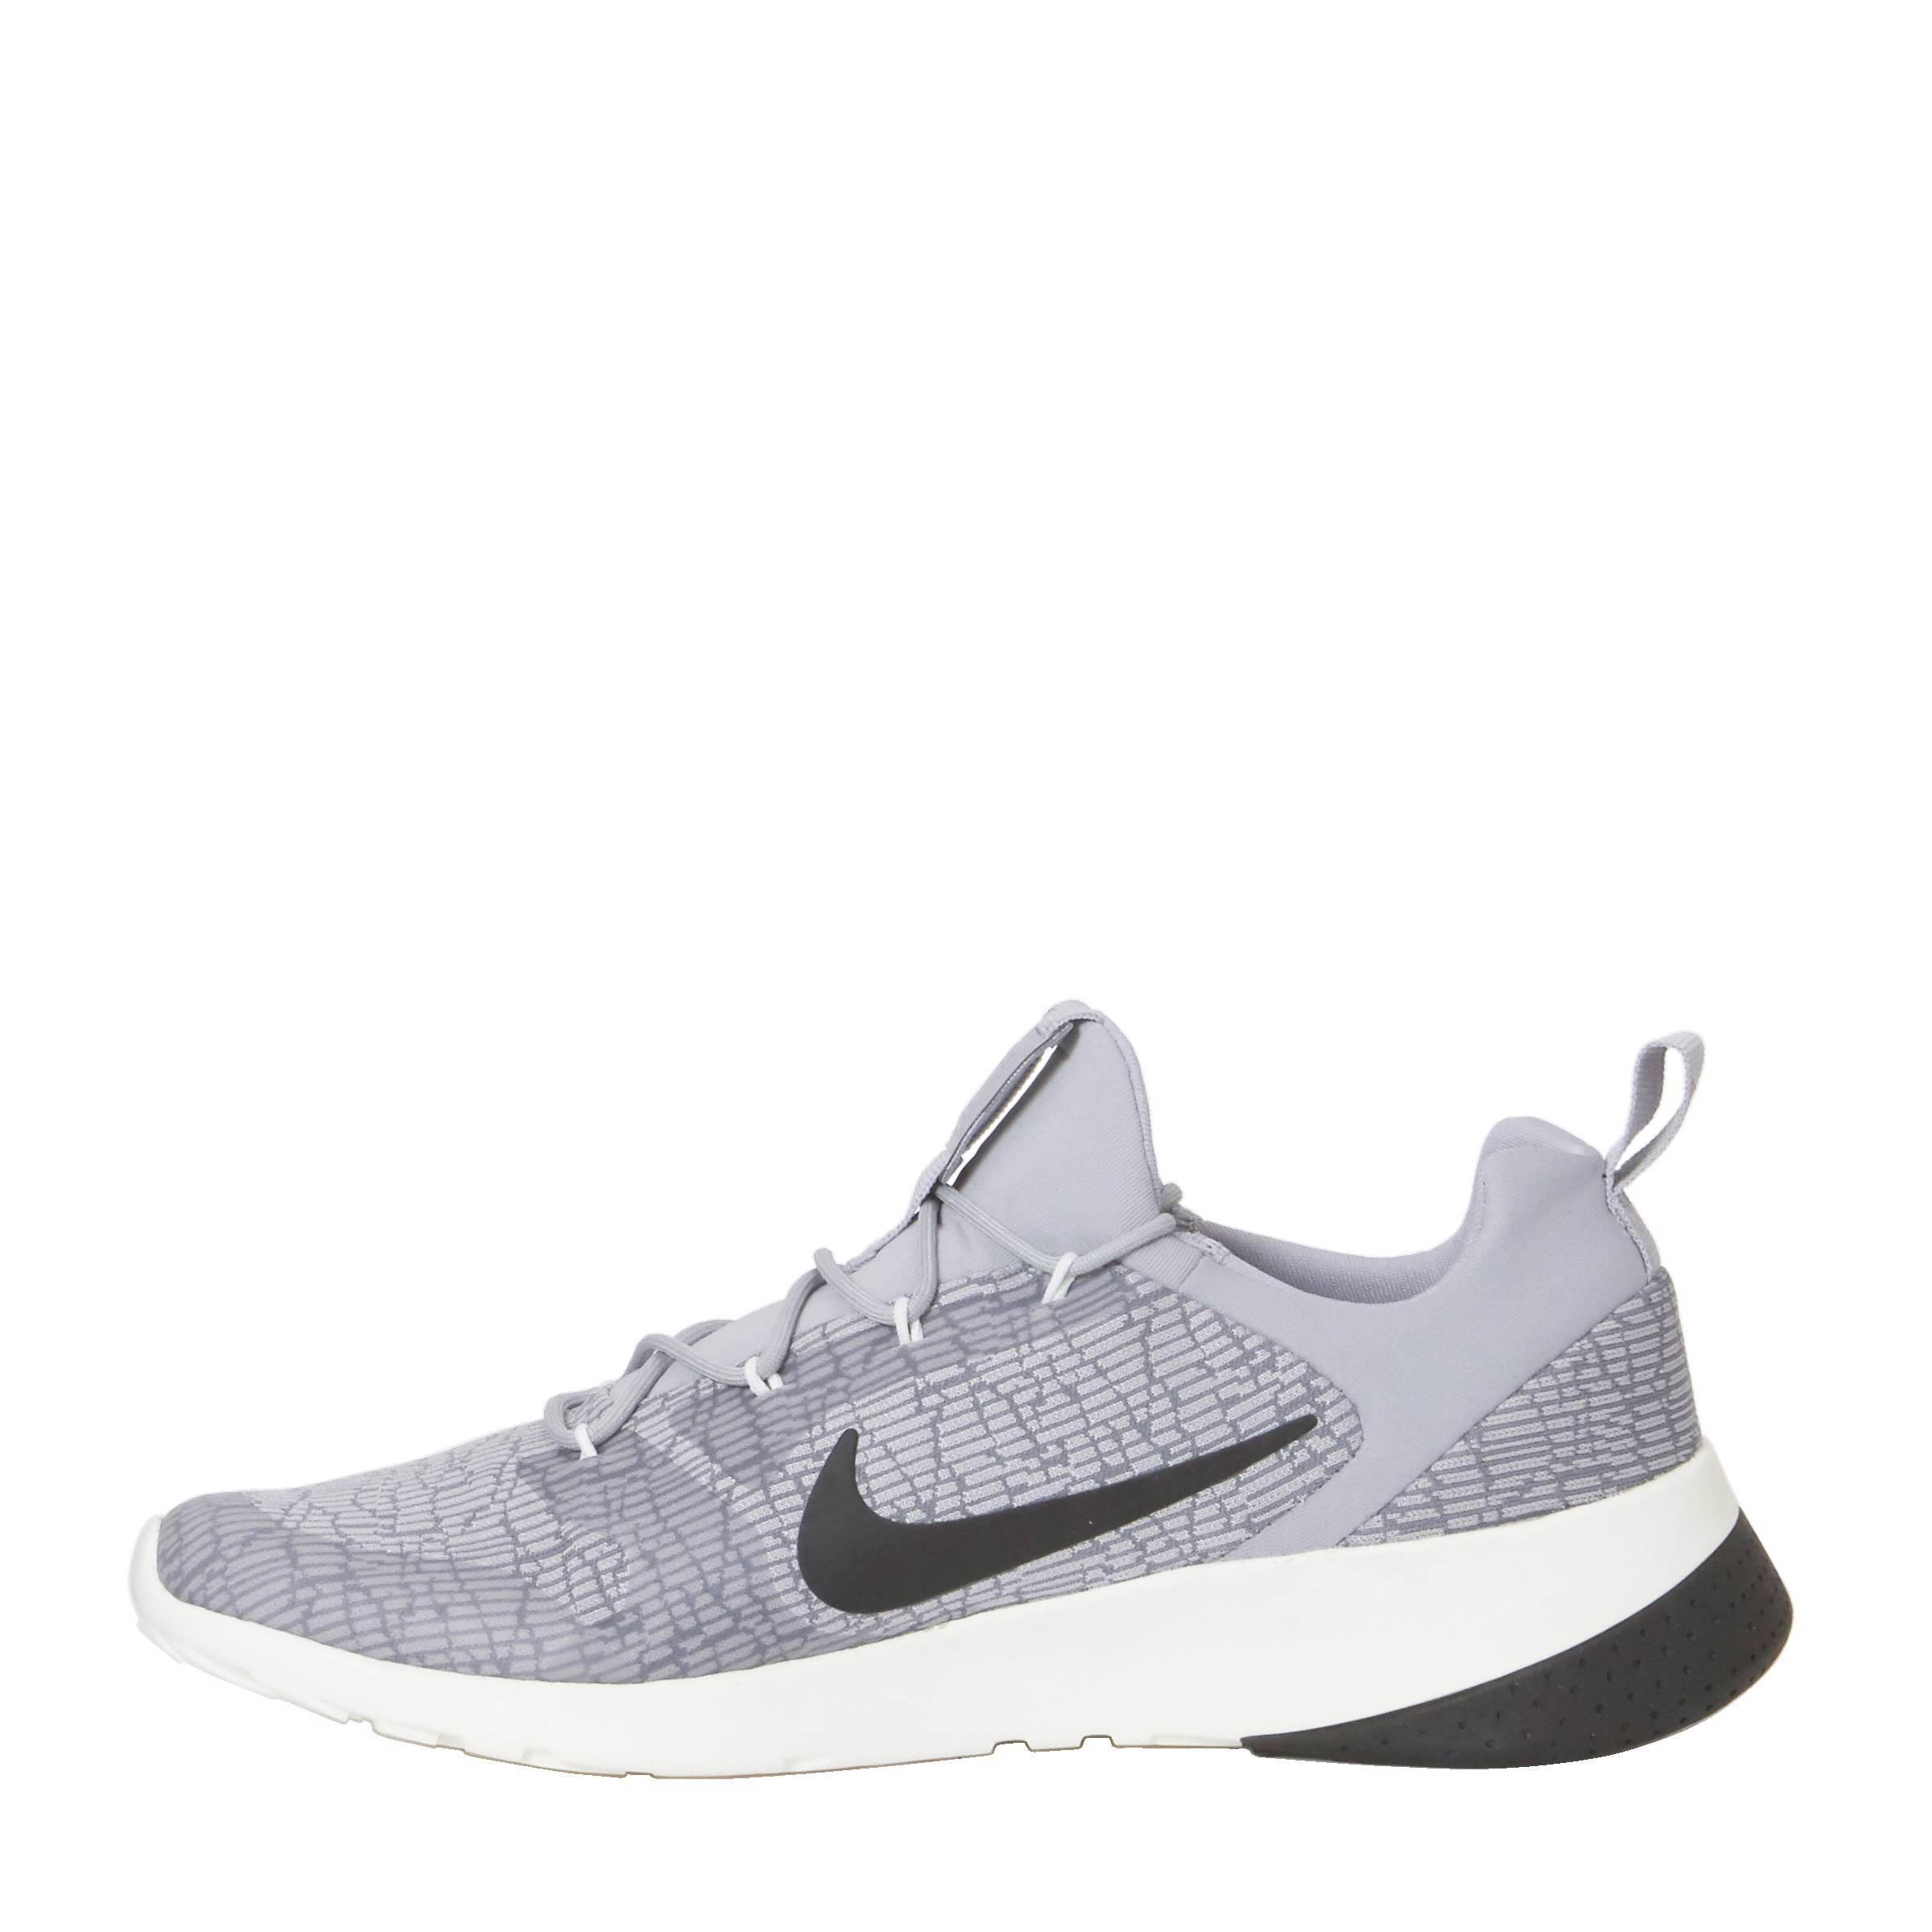 new product 2b668 904d5 Nike CK Racer sneakers  wehkamp